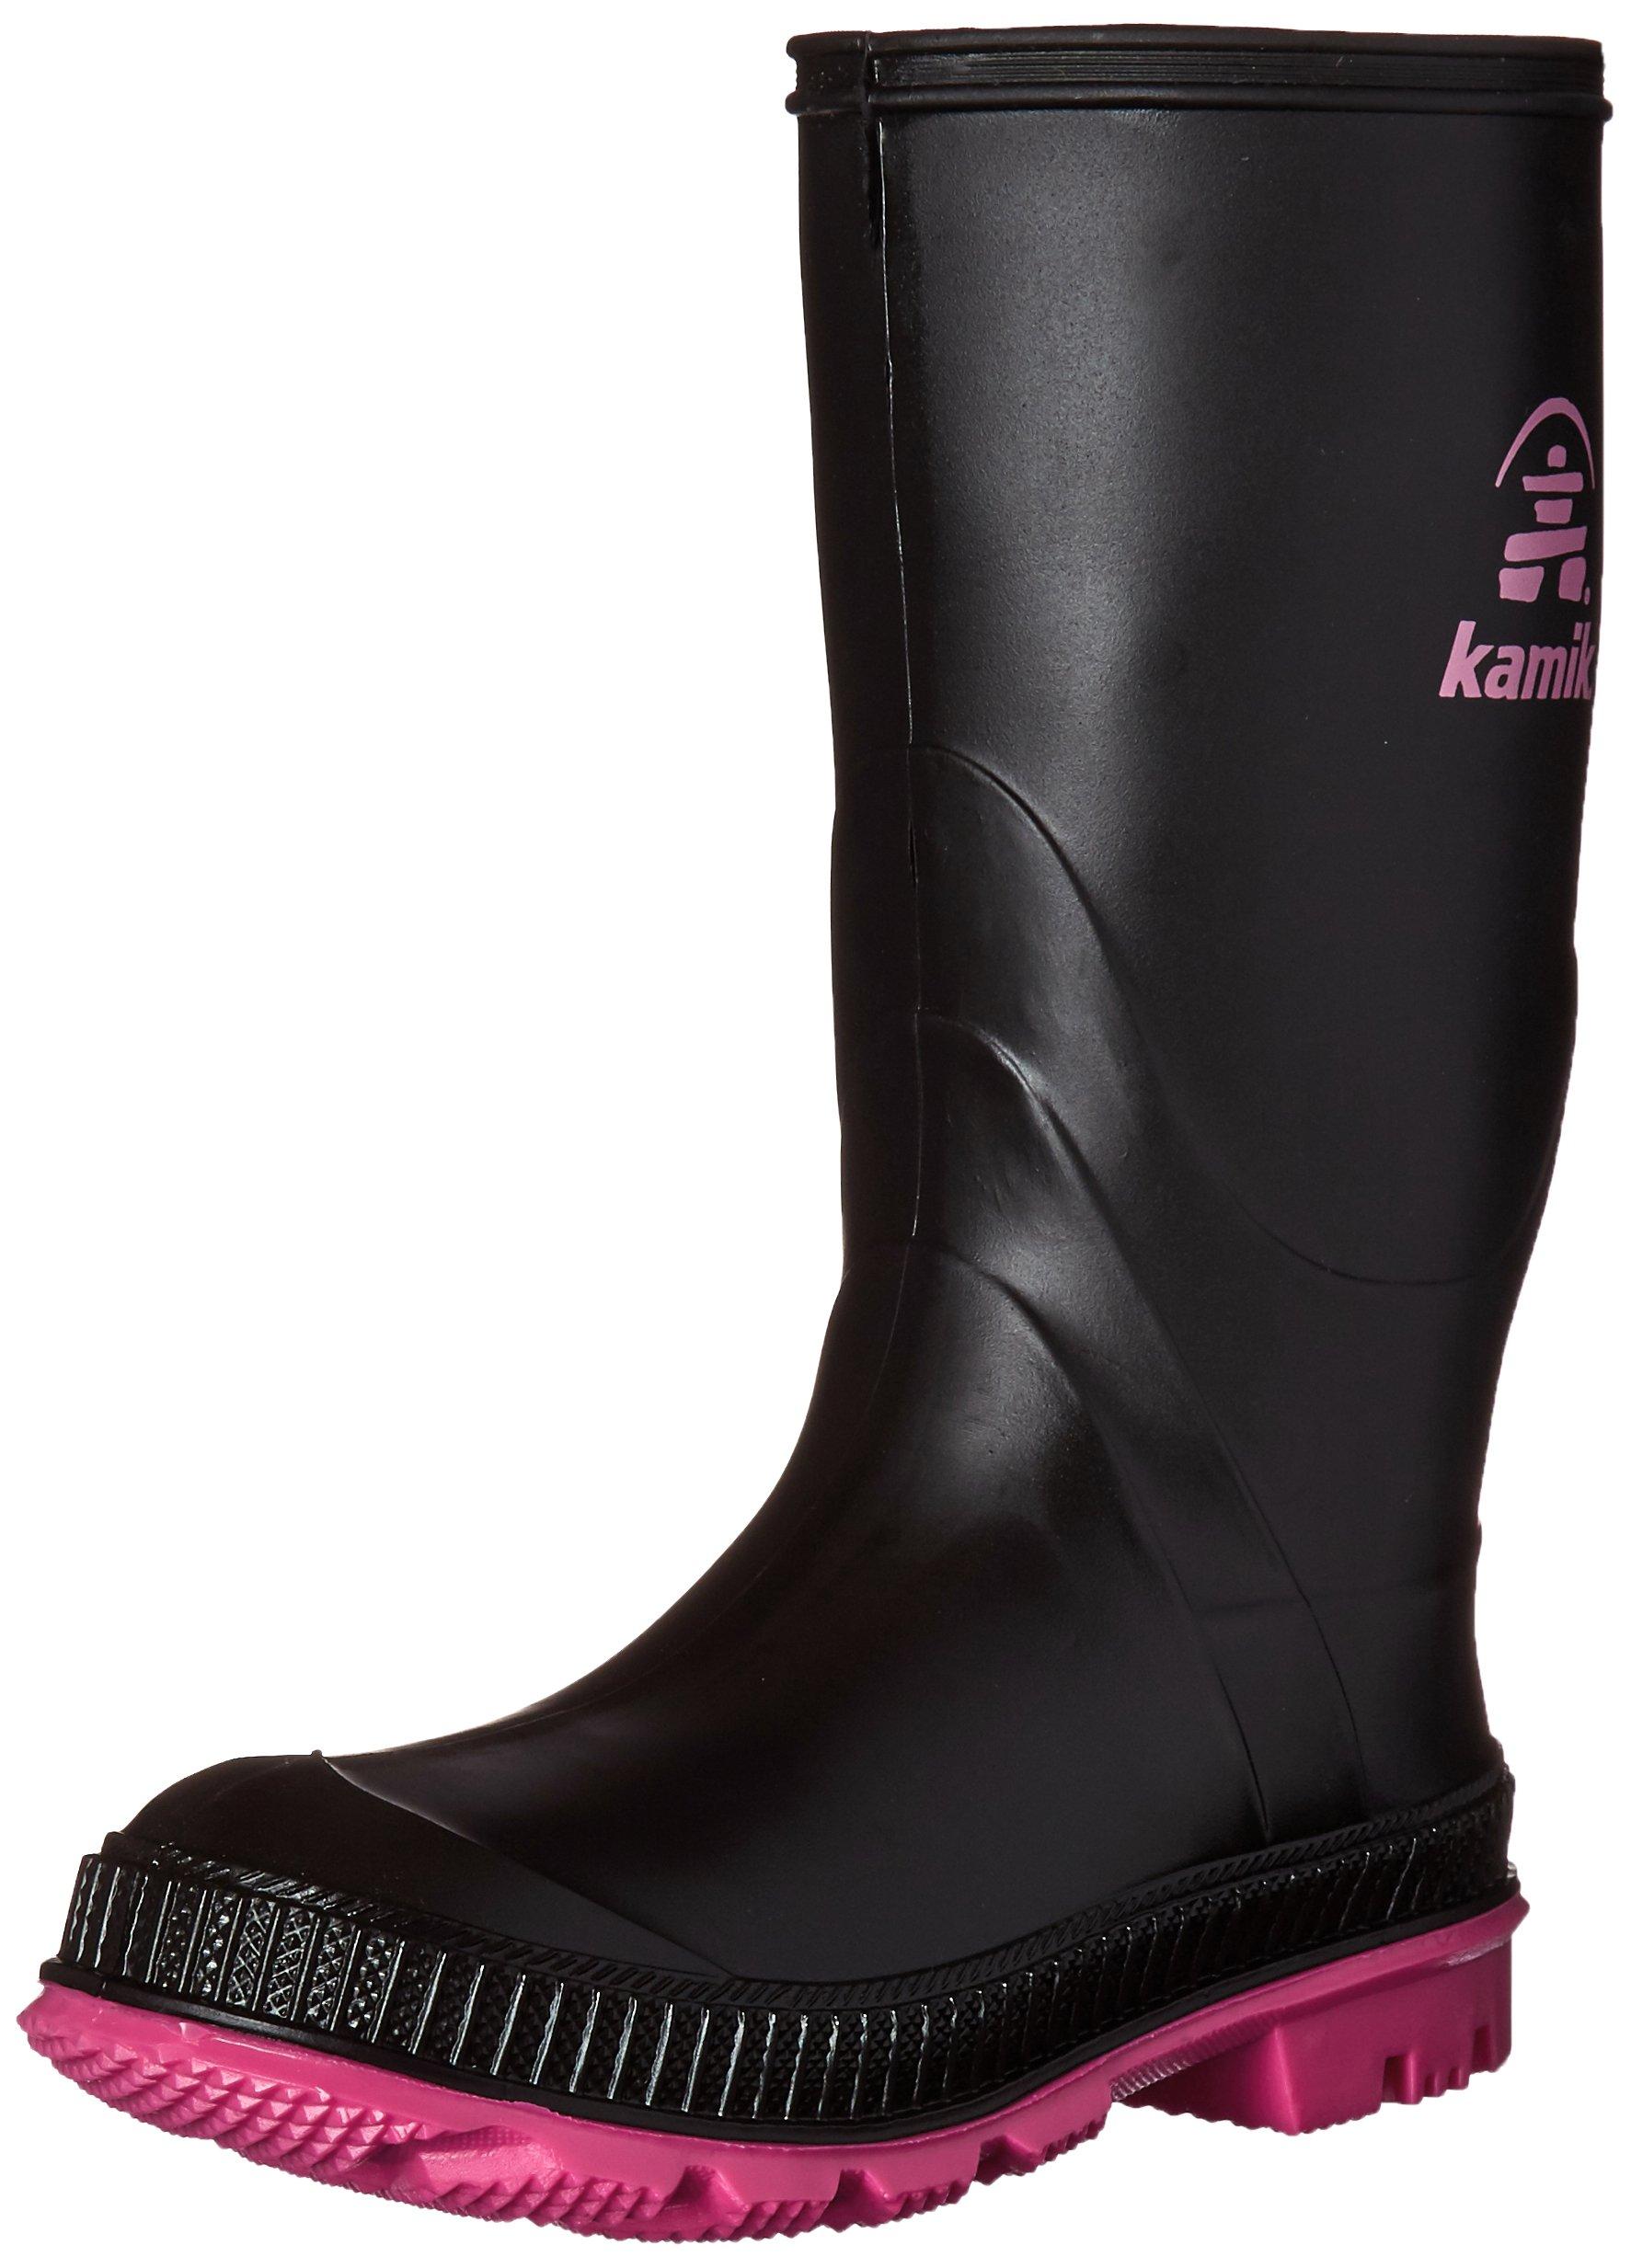 Kamik STOMP/YOUTH/PUR/6149 Rain Boot Black / Magenta,  12 M US Little Kid